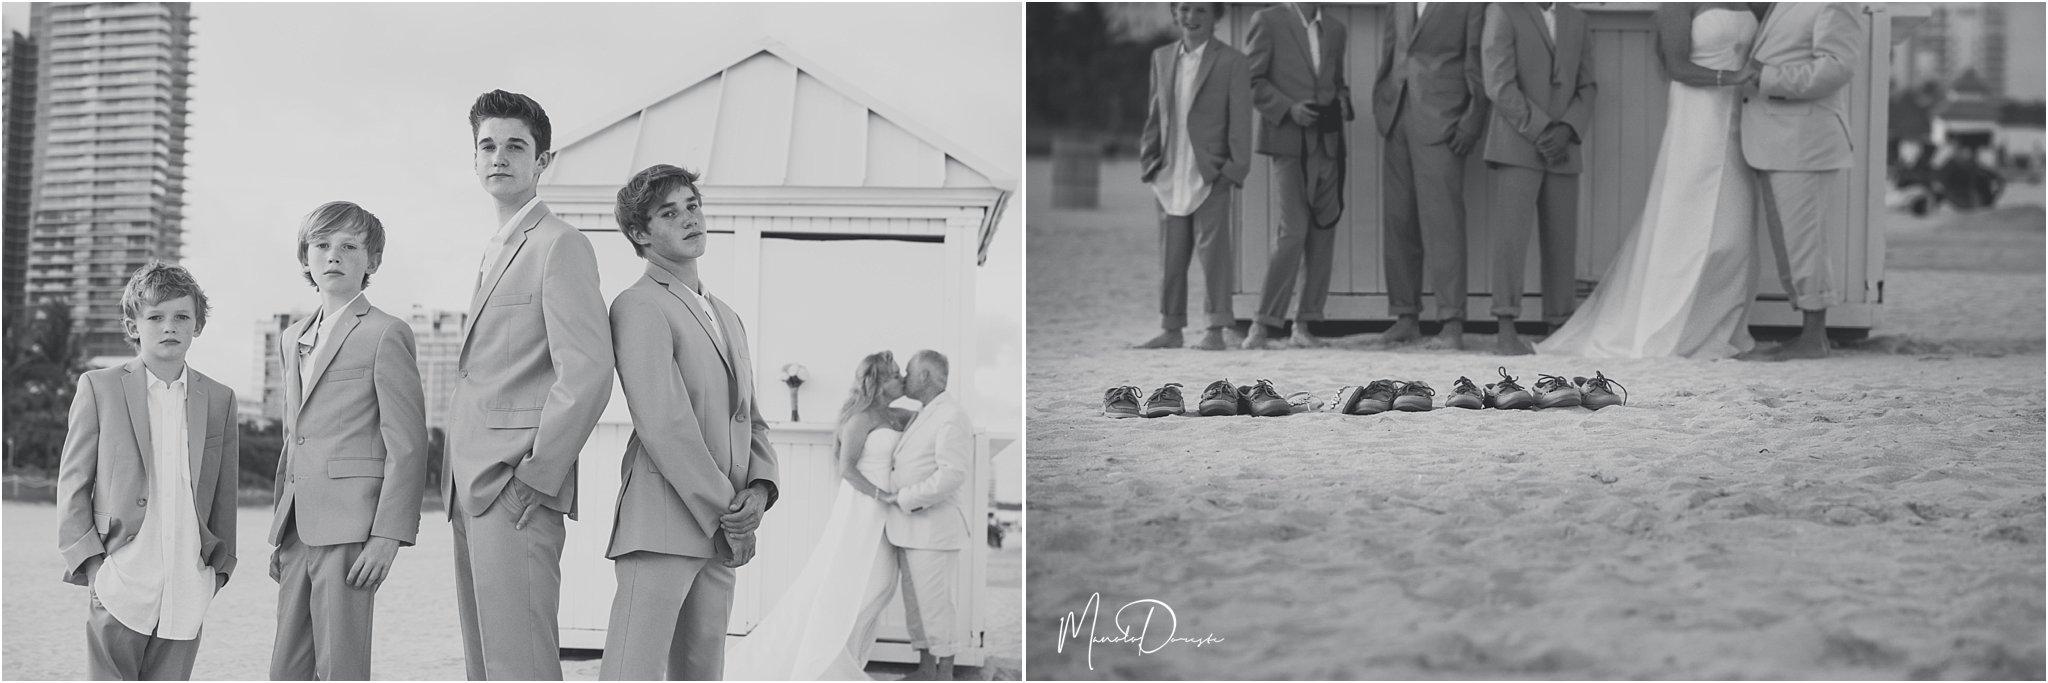 0395_ManoloDoreste_InFocusStudios_Wedding_Family_Photography_Miami_MiamiPhotographer.jpg